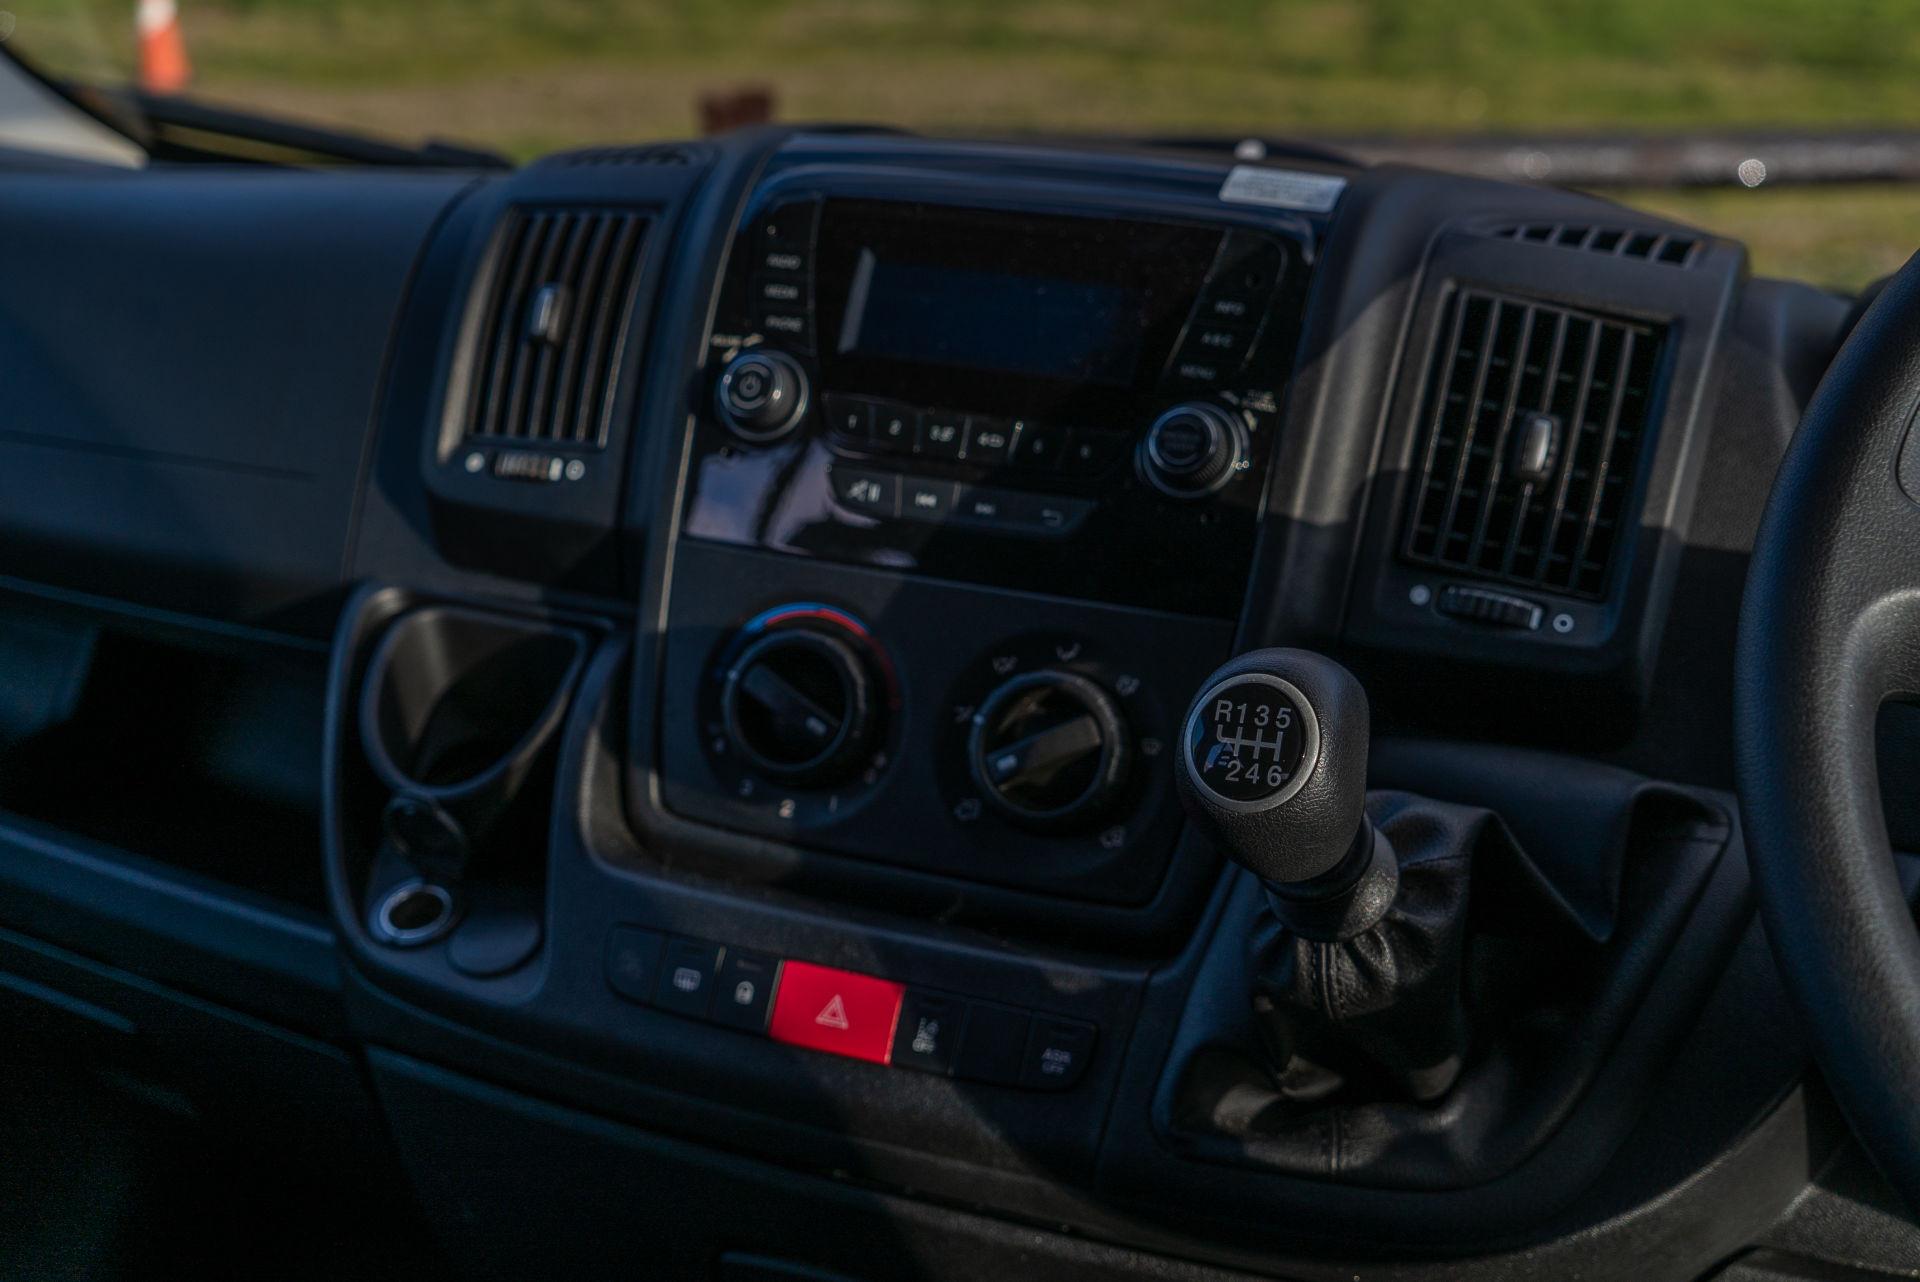 2016 Peugeot Boxer 17 Seater Accessible Minibus for Sale - Image 6